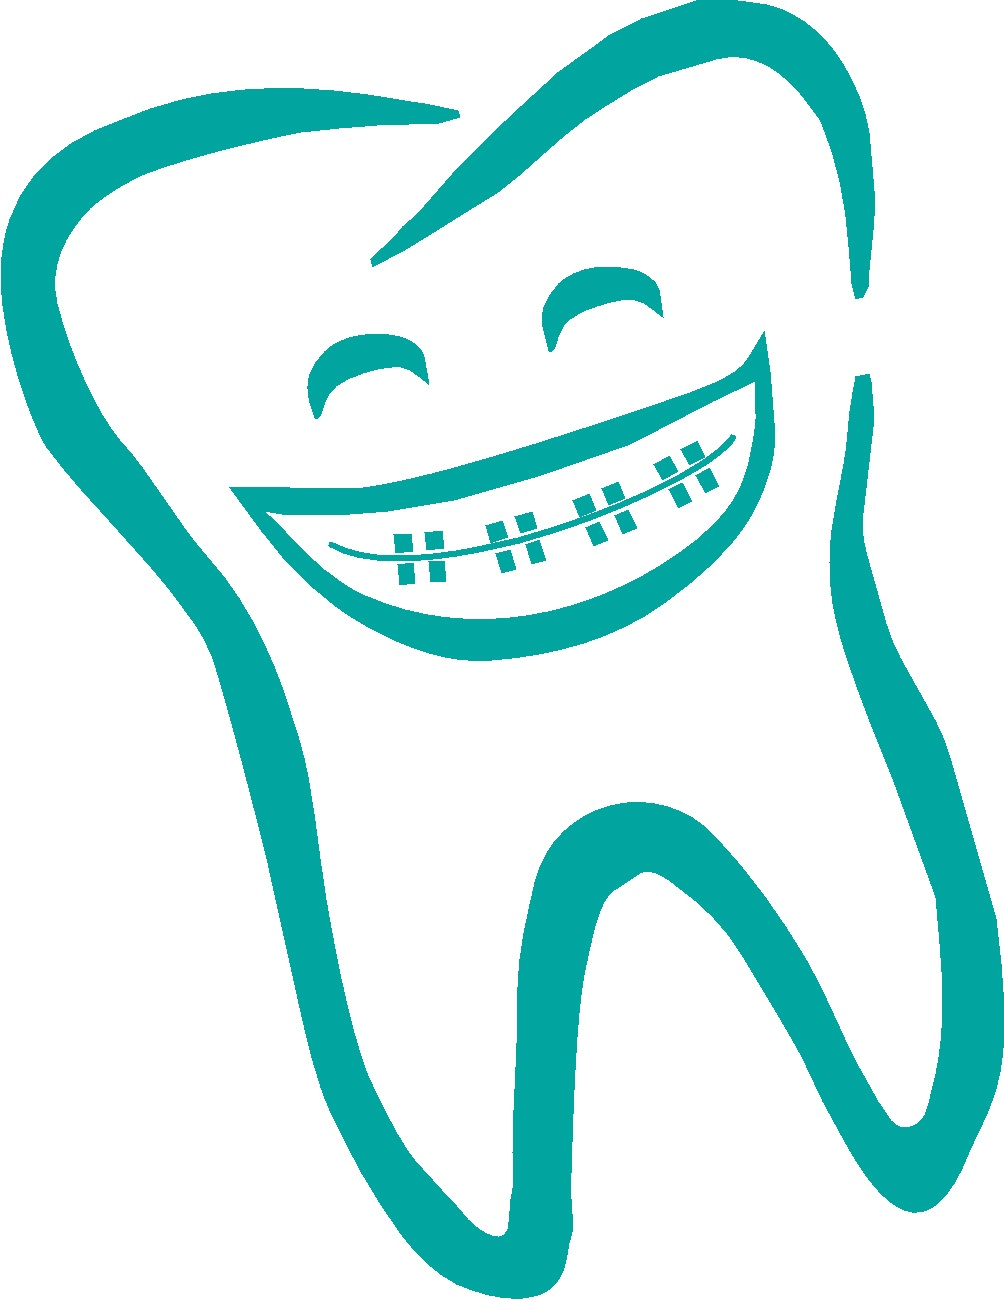 Pierce Orthodontics - Patient Information | Pierce Orthodontics